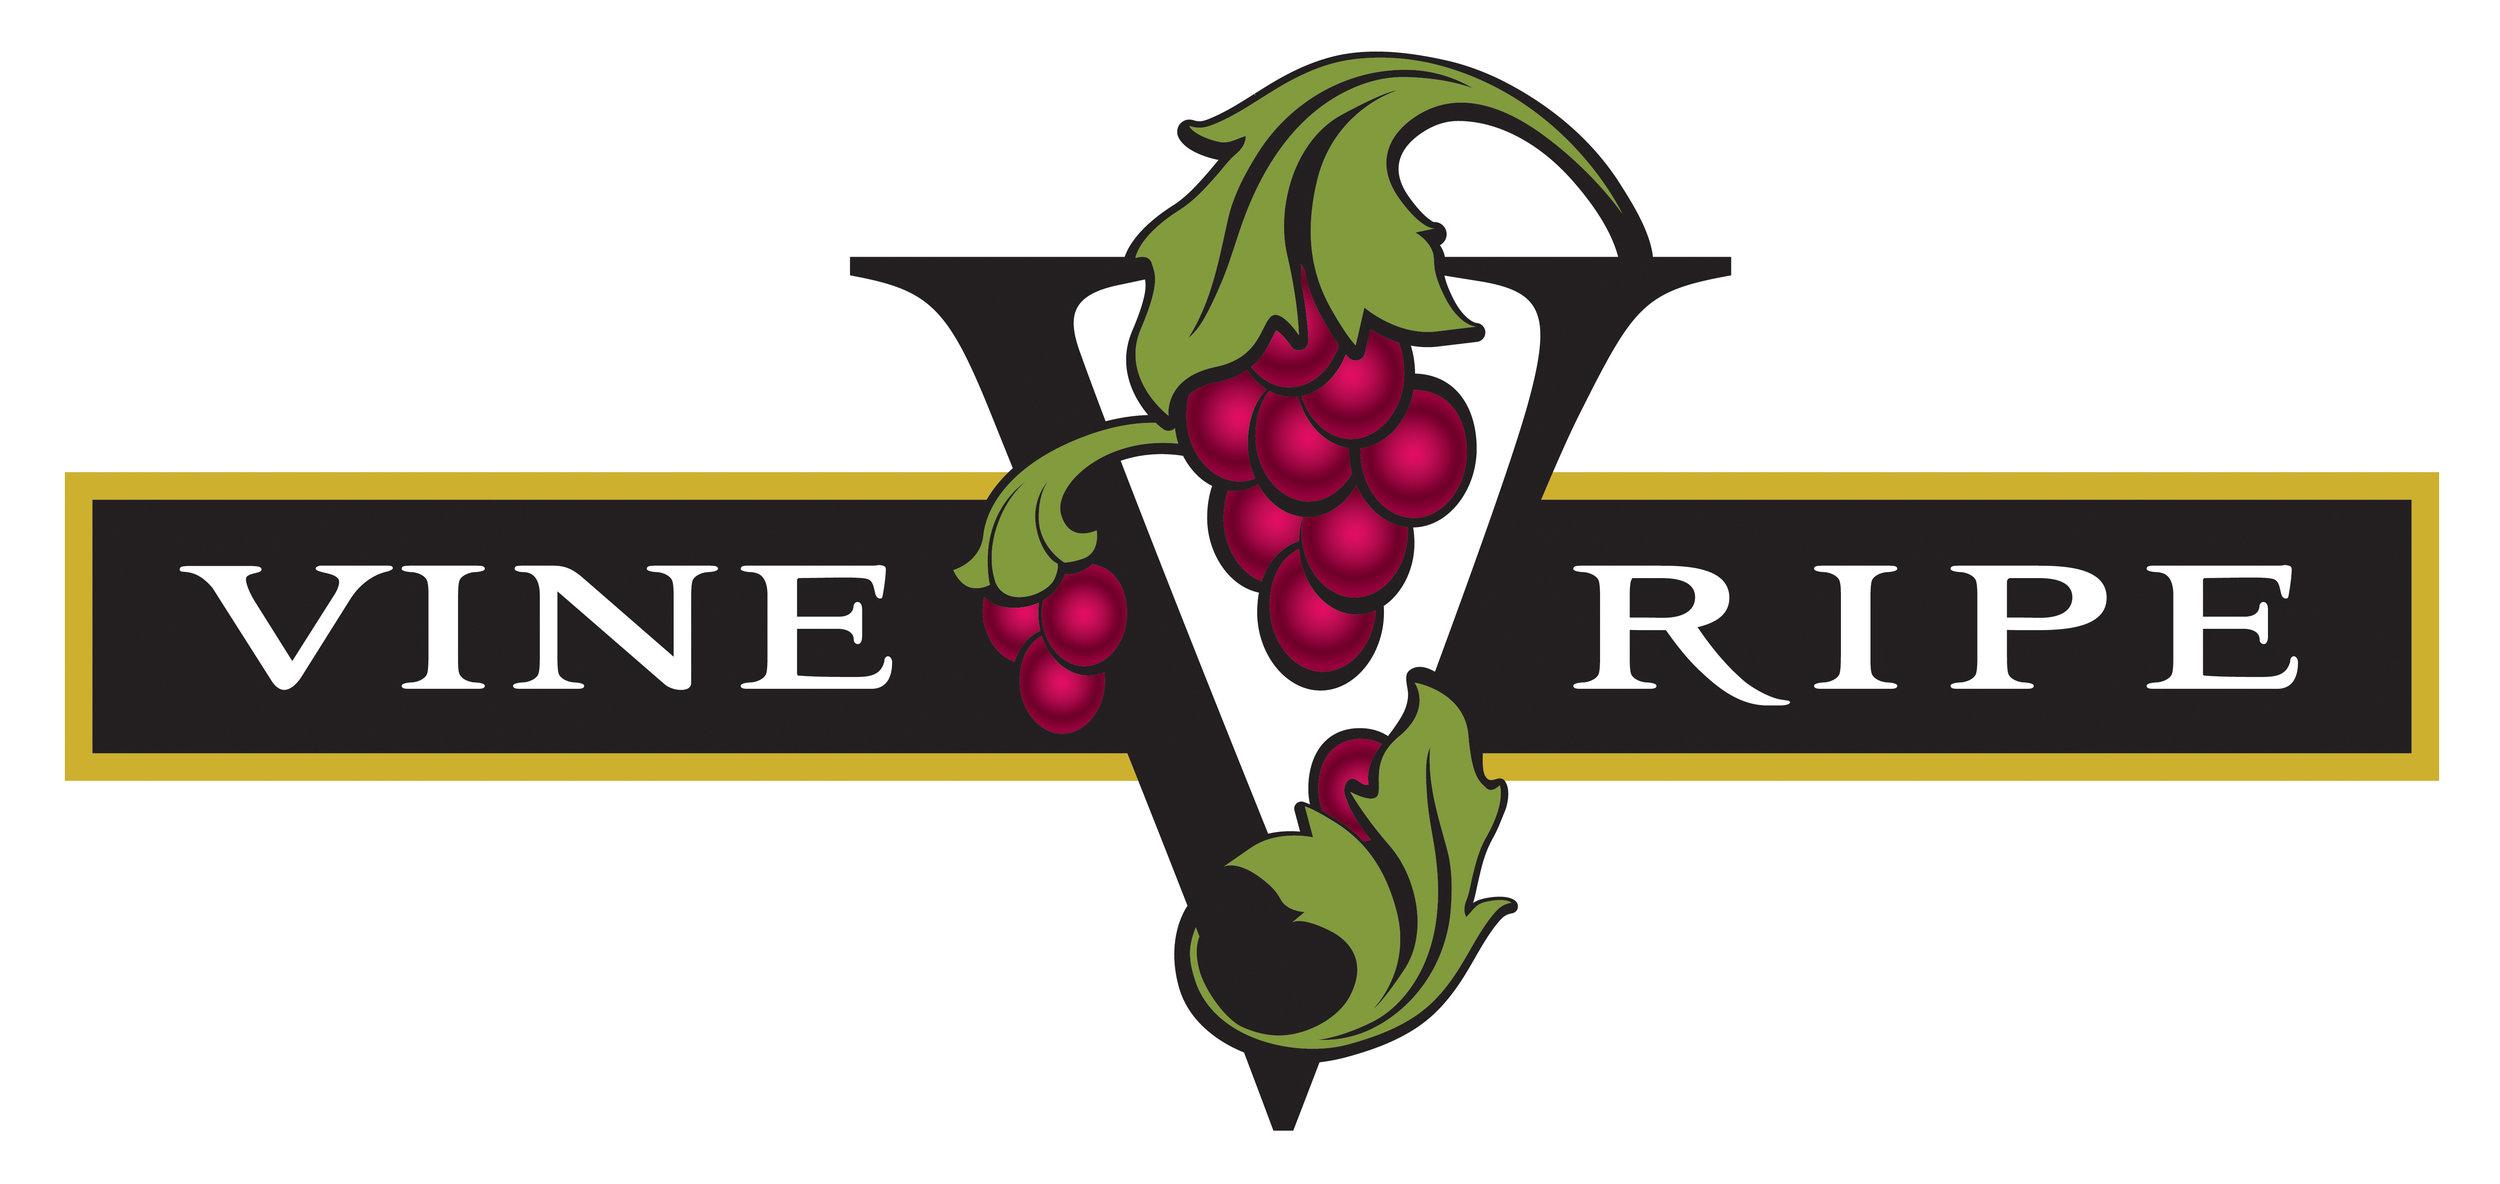 Vineripe_Logo-JPG-Large.jpg